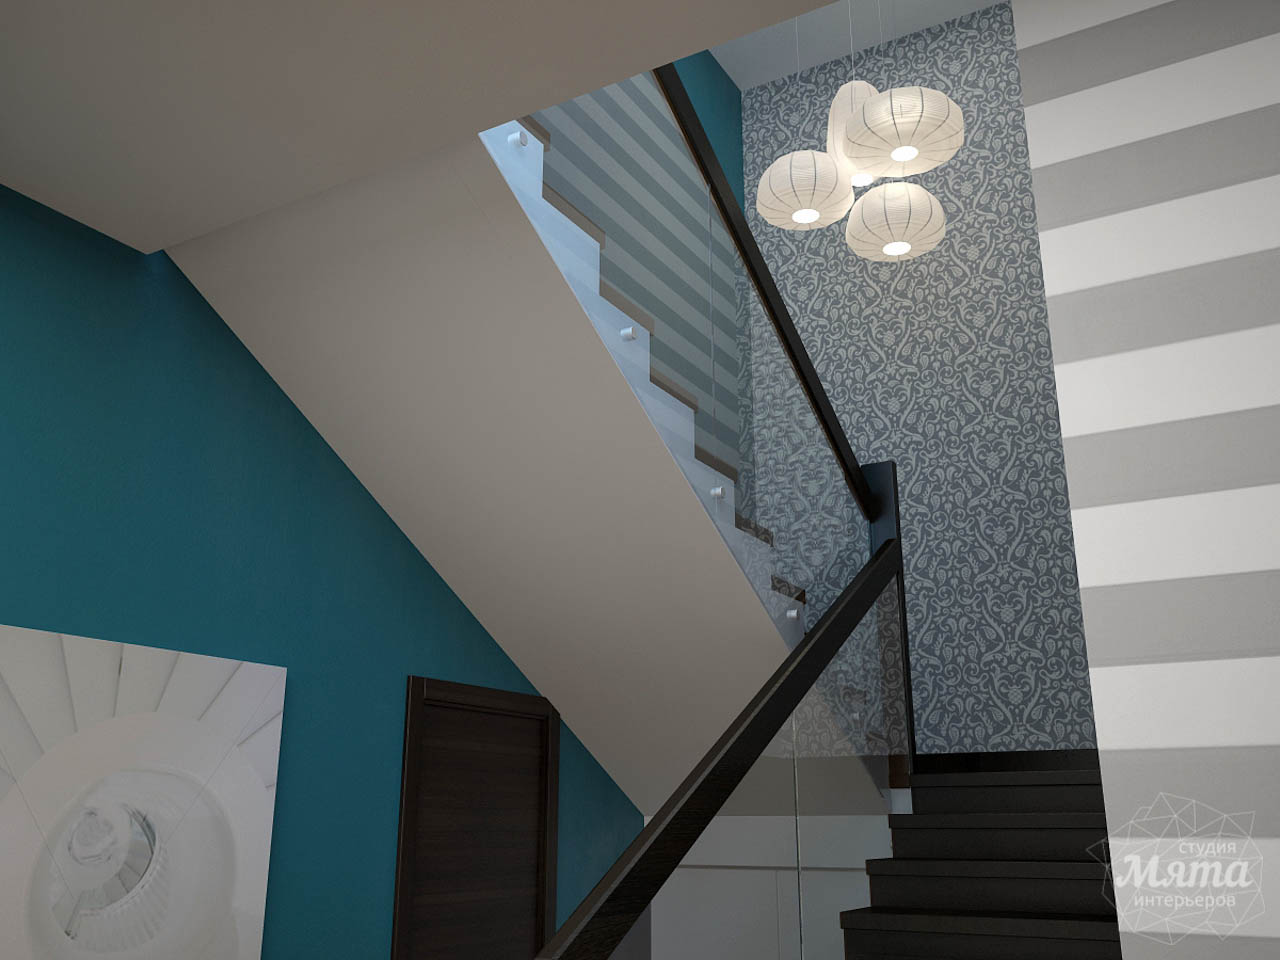 Дизайн проект интерьера коттеджа  в стиле минимализм по ул. Барвинка 15 img1888364359